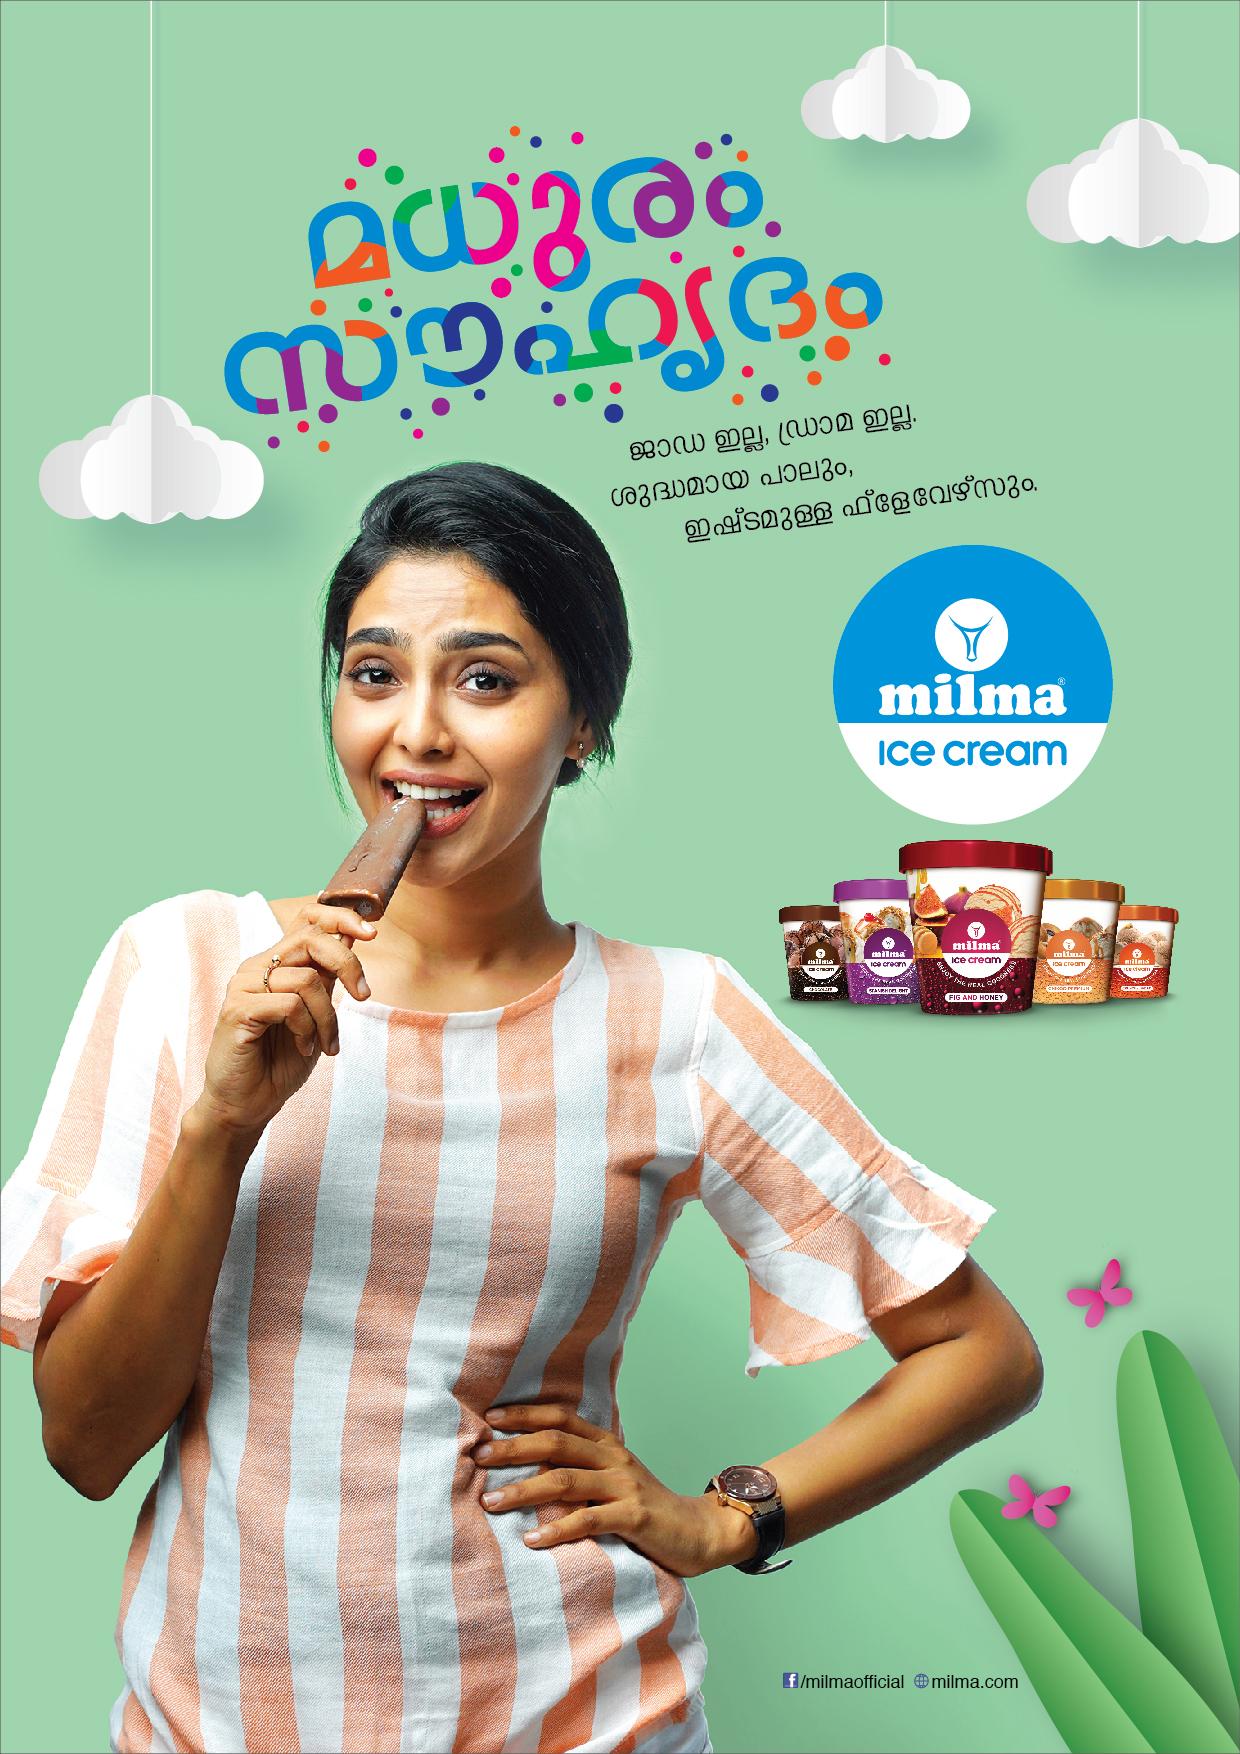 Milma Icecream Advertisement by Malayalam Actress Aishwarya Lekshmi | Print mock-up 2 by Stark Communications Pvt Ltd